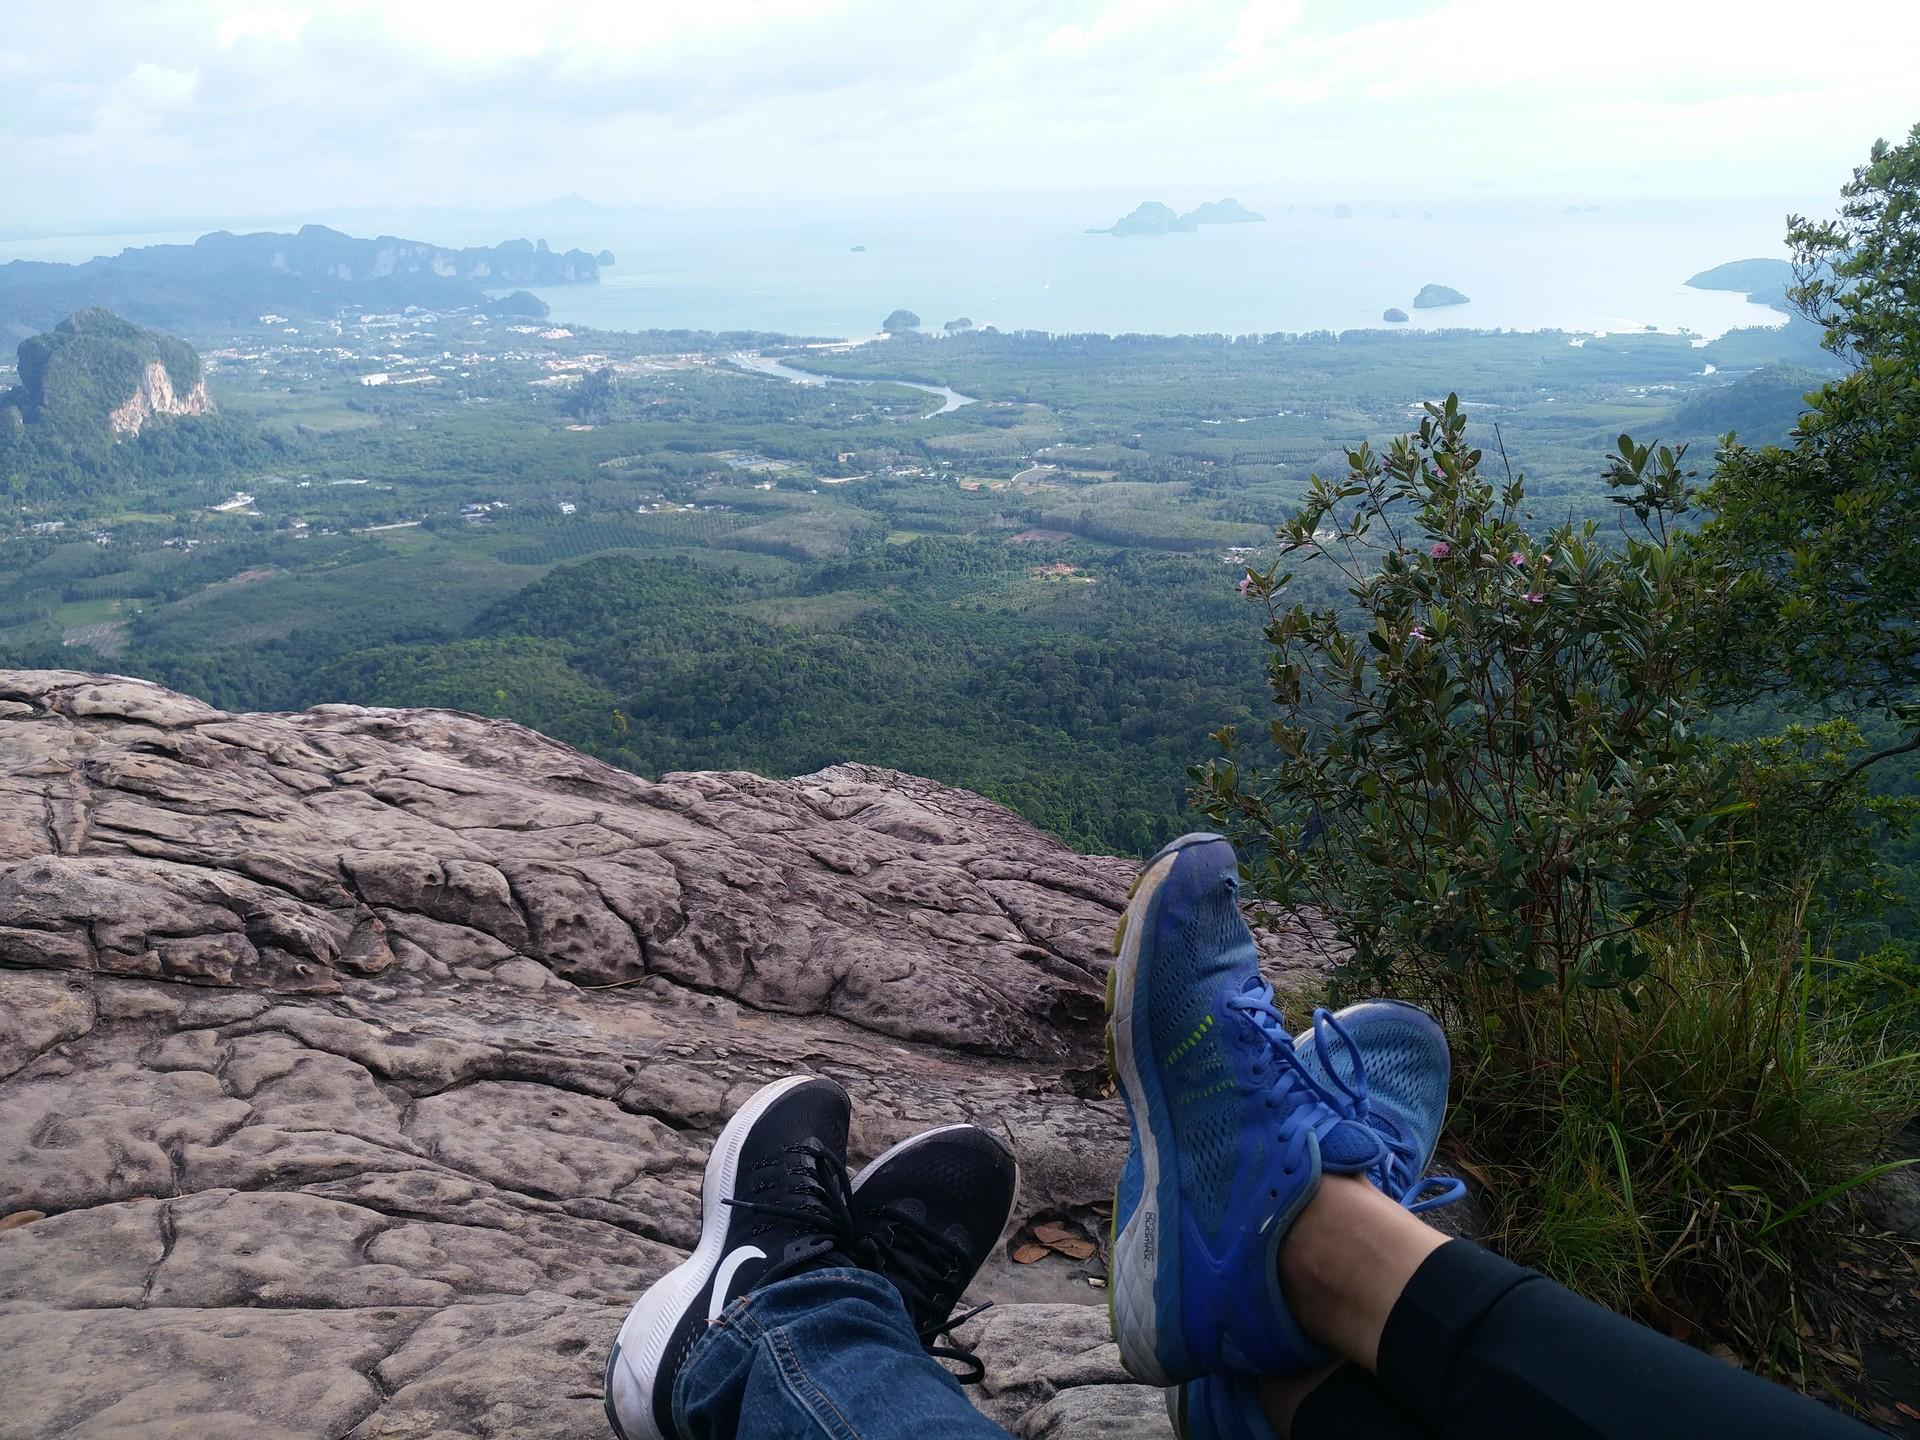 hiking-dragon-crest-mountain-trail-de51e